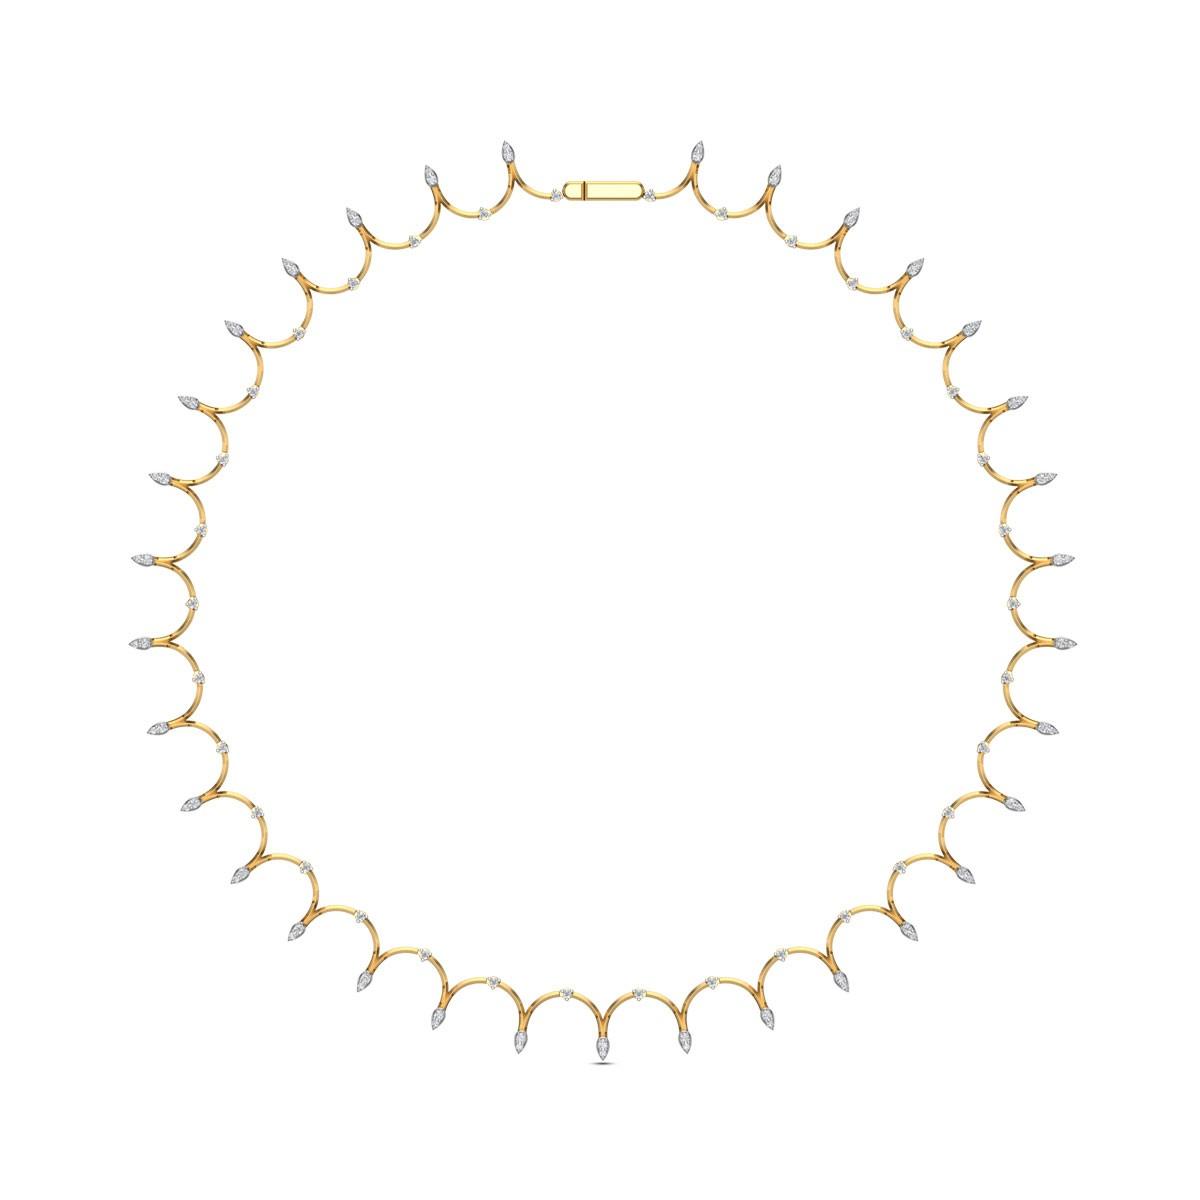 Diamond Necklace DJNC5131